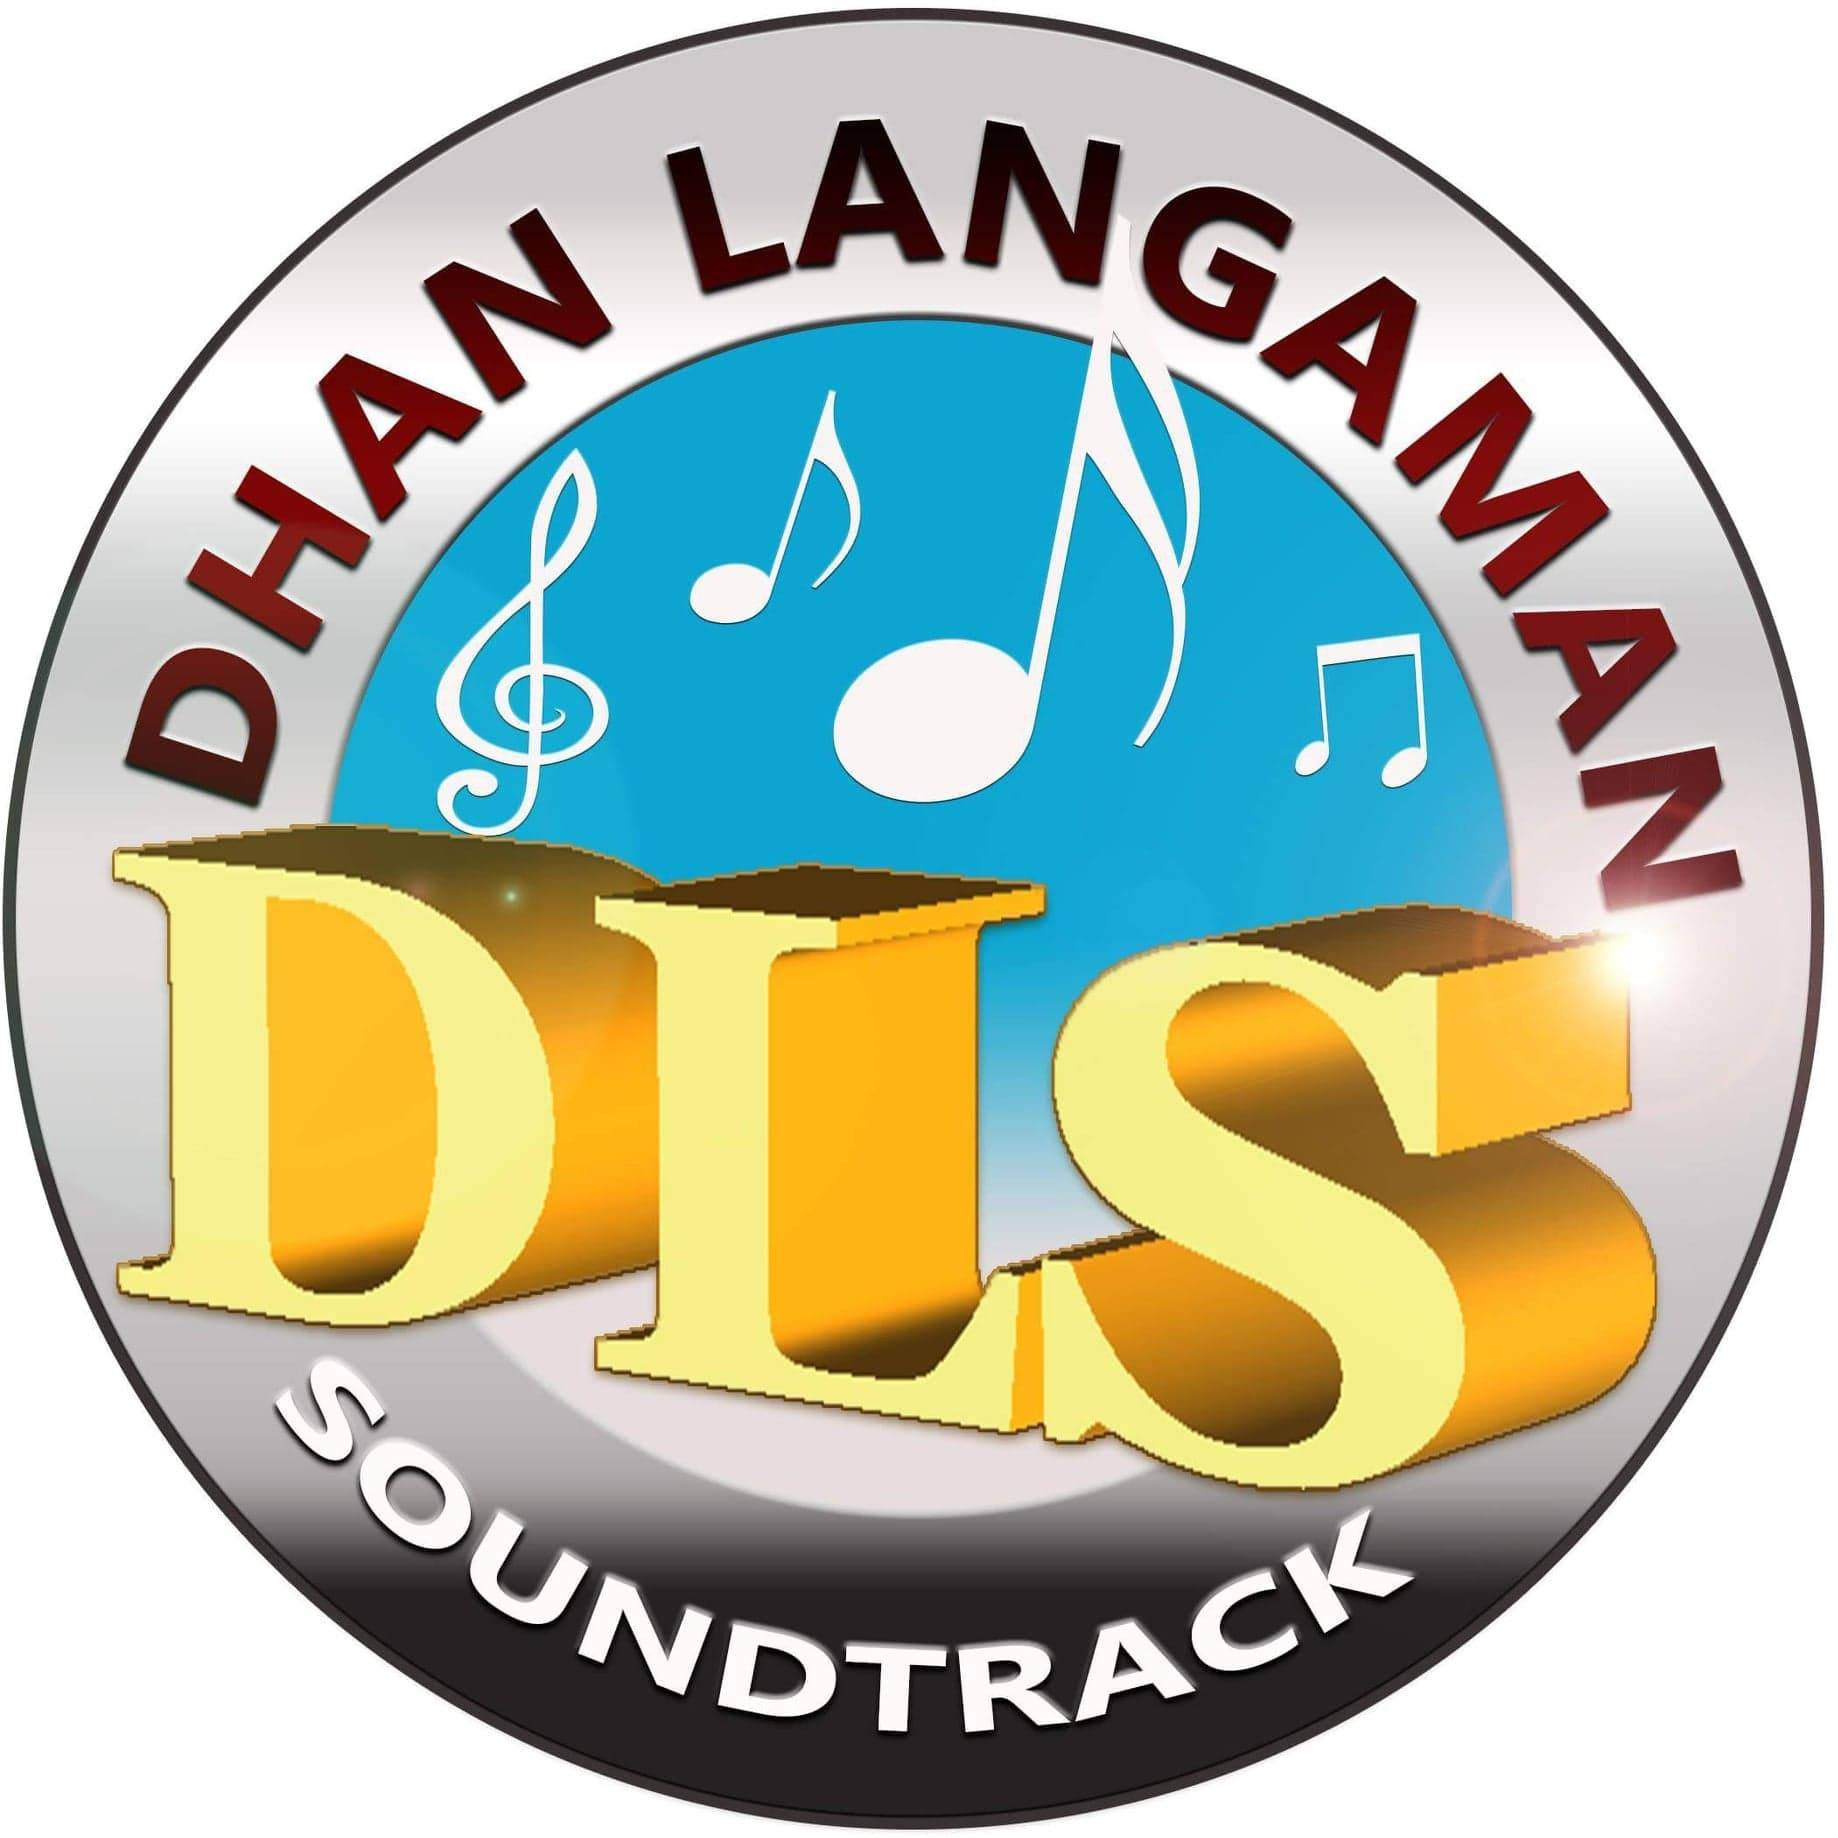 DLS SOUNDTRACK ONLINE RADIO